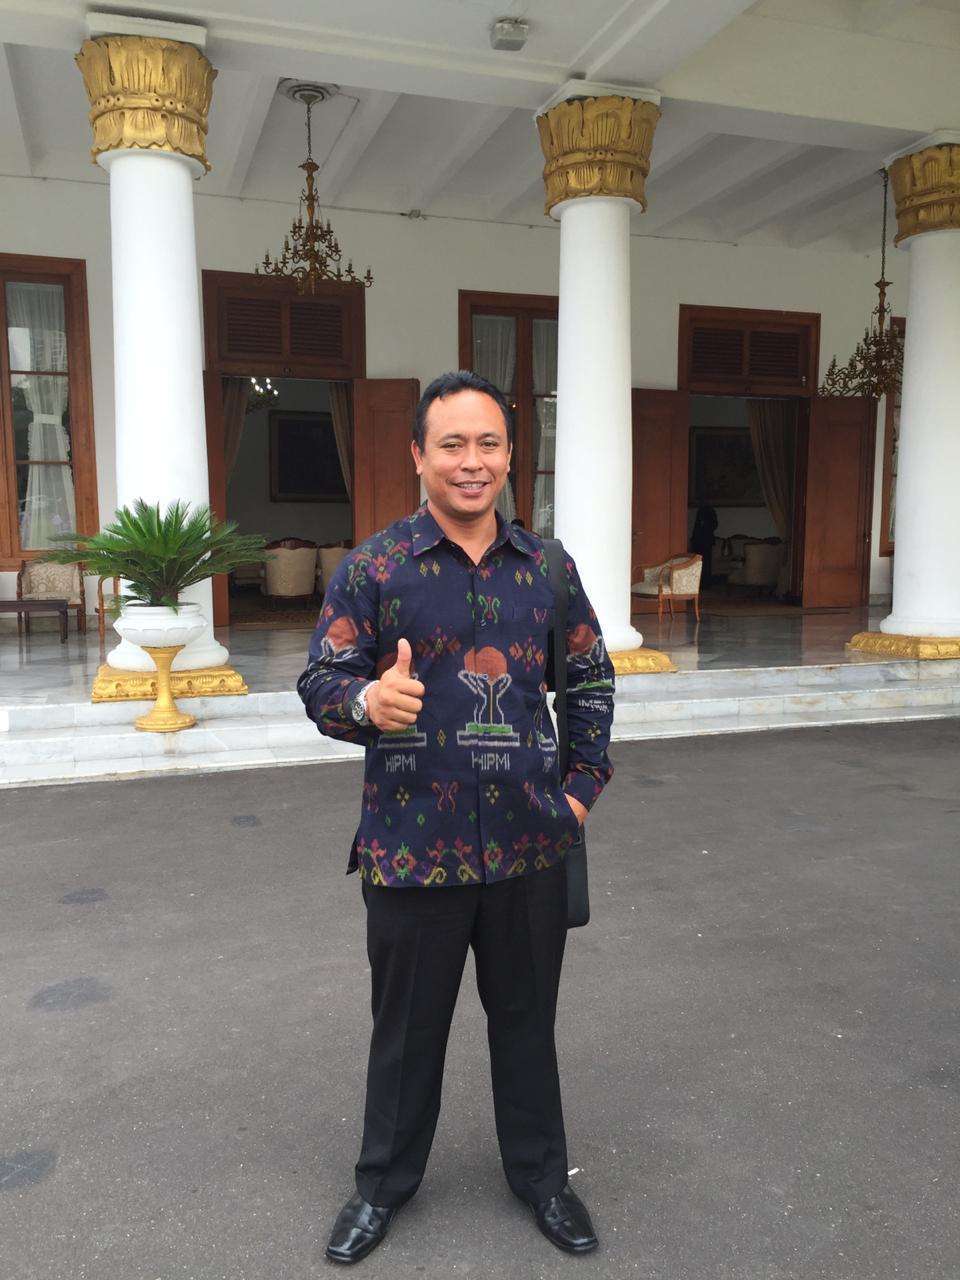 Kader Golkar Gung Cok pertanyakan calon yang diusung partainya di Pilkada Badung. Foto: Lintasnusanews.com/Istimewa